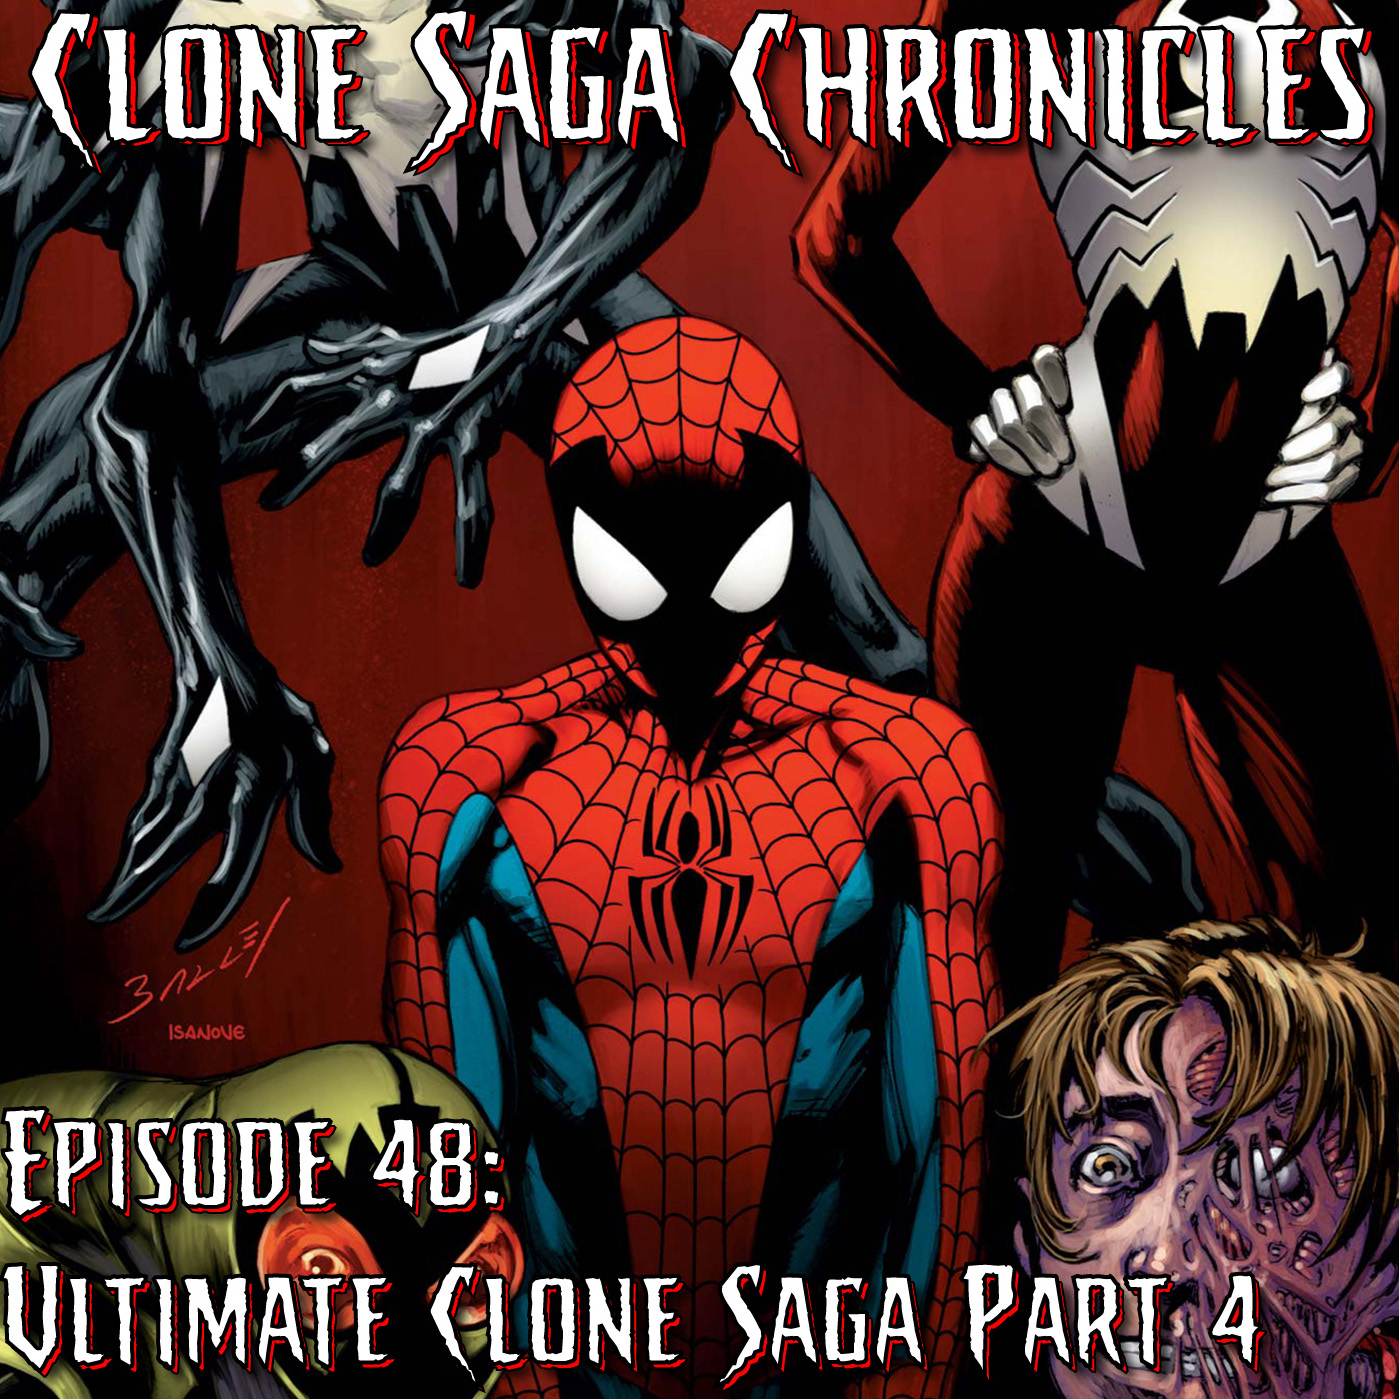 CSC Episode 48 Ultimate Clone Saga Part 4